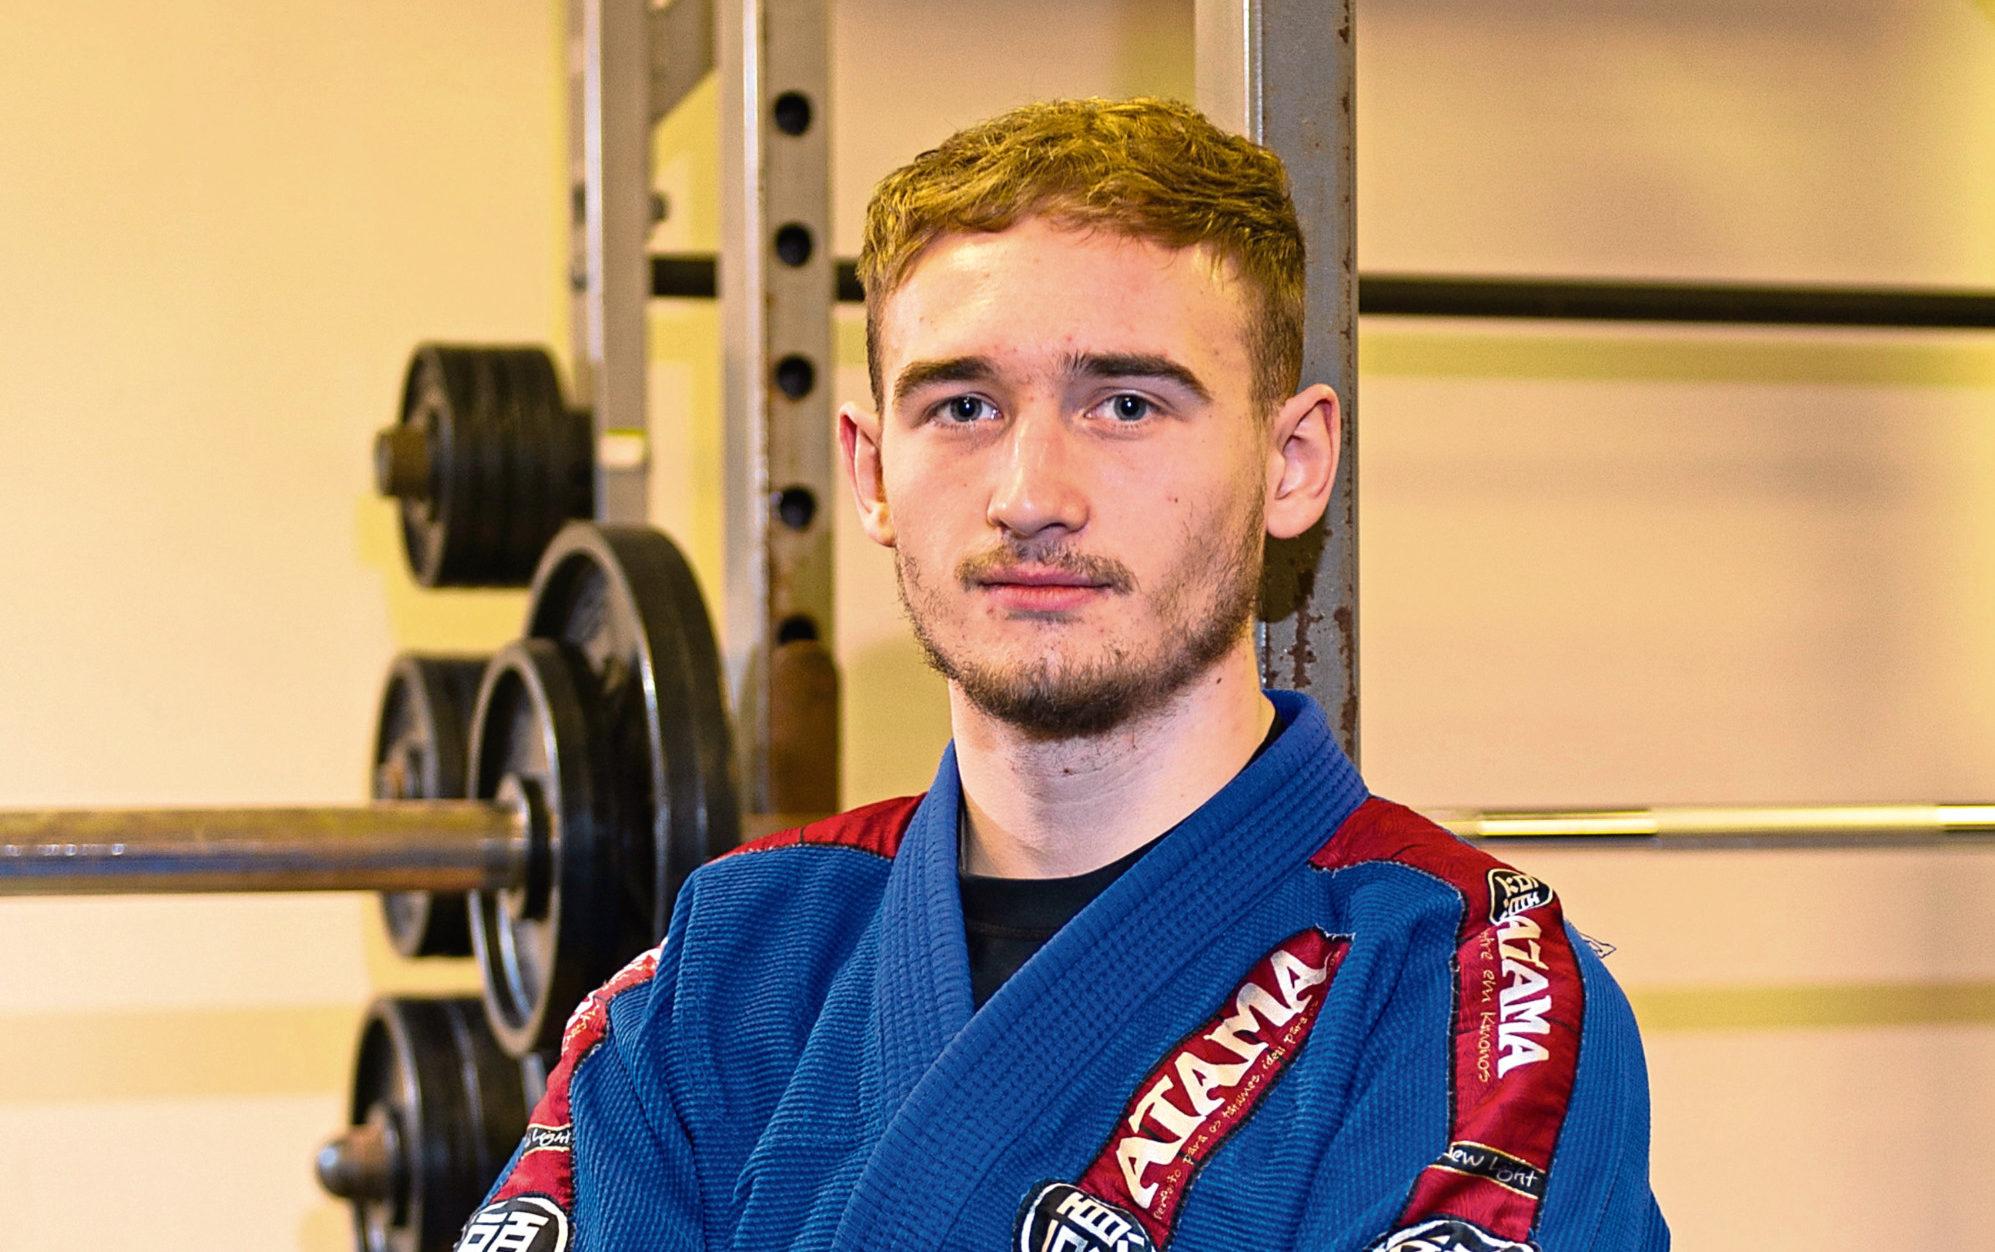 Brazilian jiu jitsu martial artist Patrick Rowan